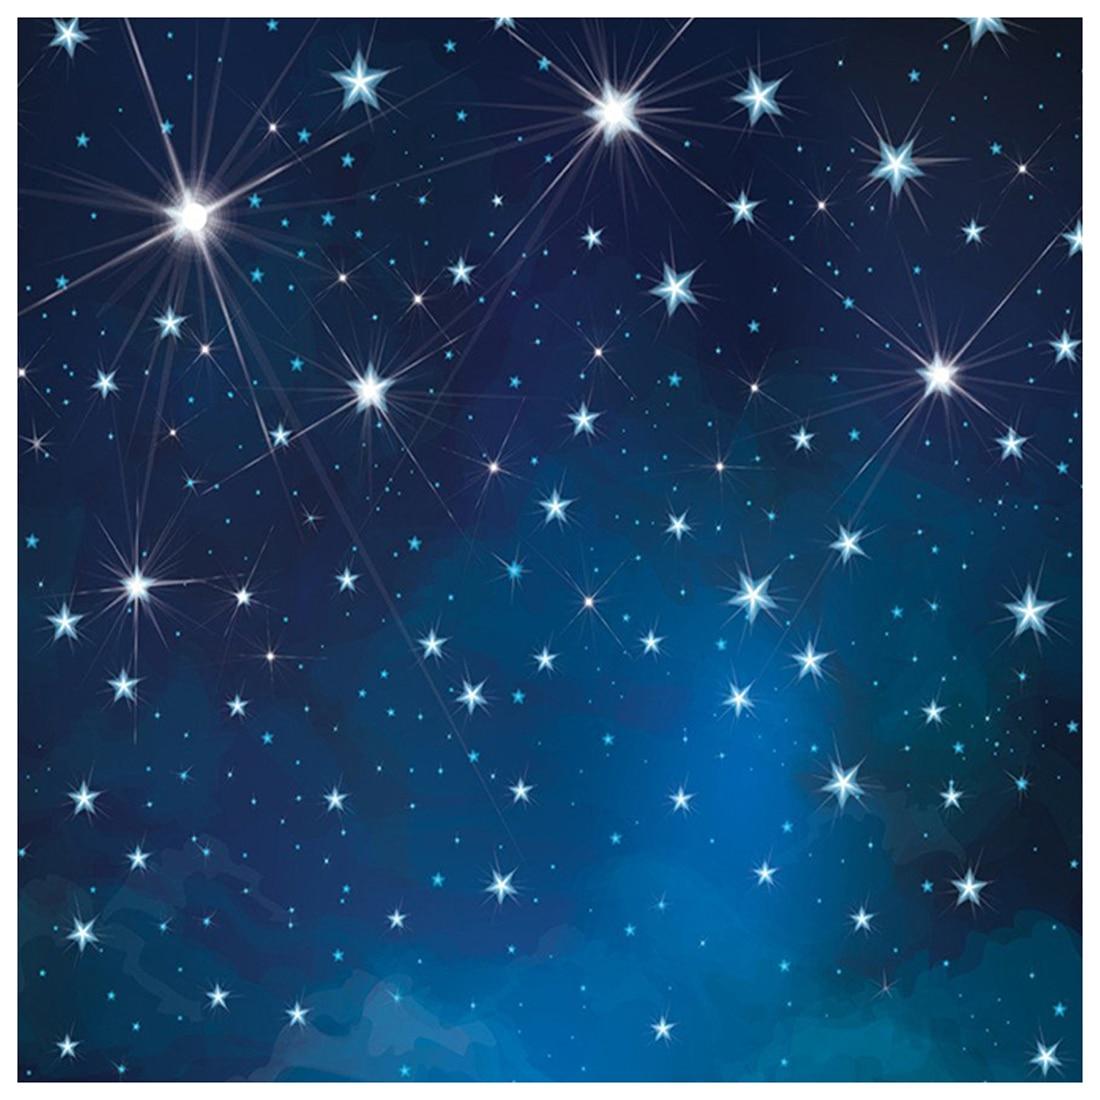 5x7ft Evening Blue Sky Photography Backdrops No Wrinkles Fantasy Stars Background For Children Birthday Photo Studio blue sky чаша северный олень